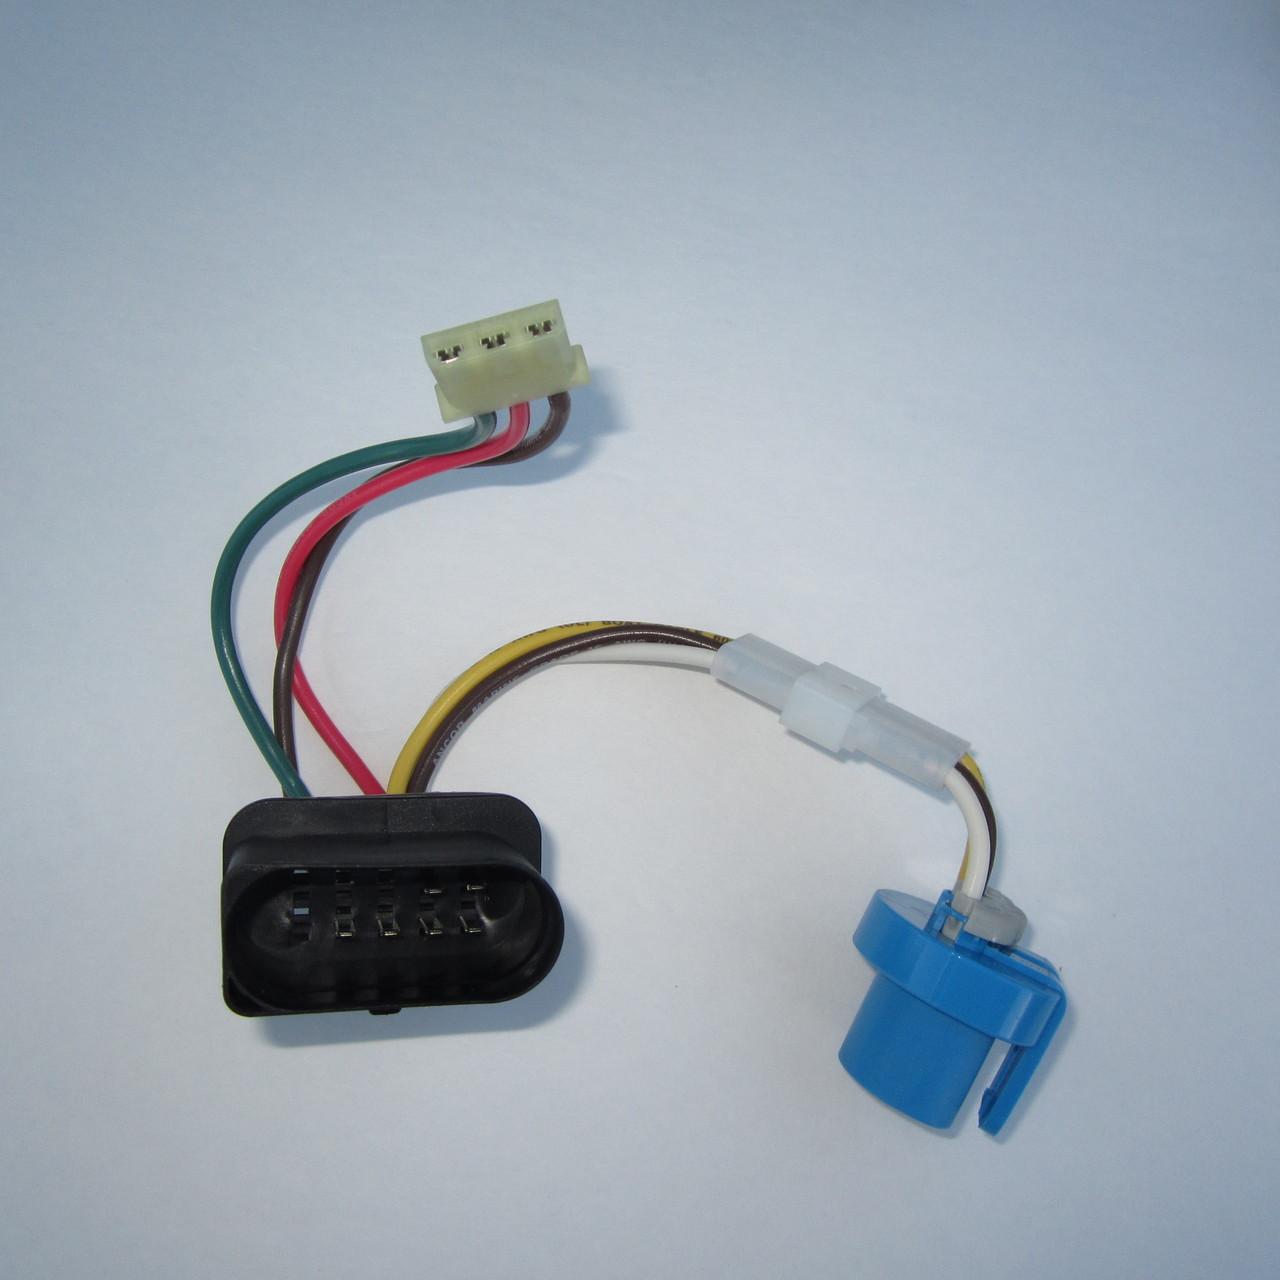 Upgraded Headlight Wiring Harness | VW MK4 Jetta | 2 Pack | 2014 Vw Jetta Wire Harness |  | TuneMyEuro